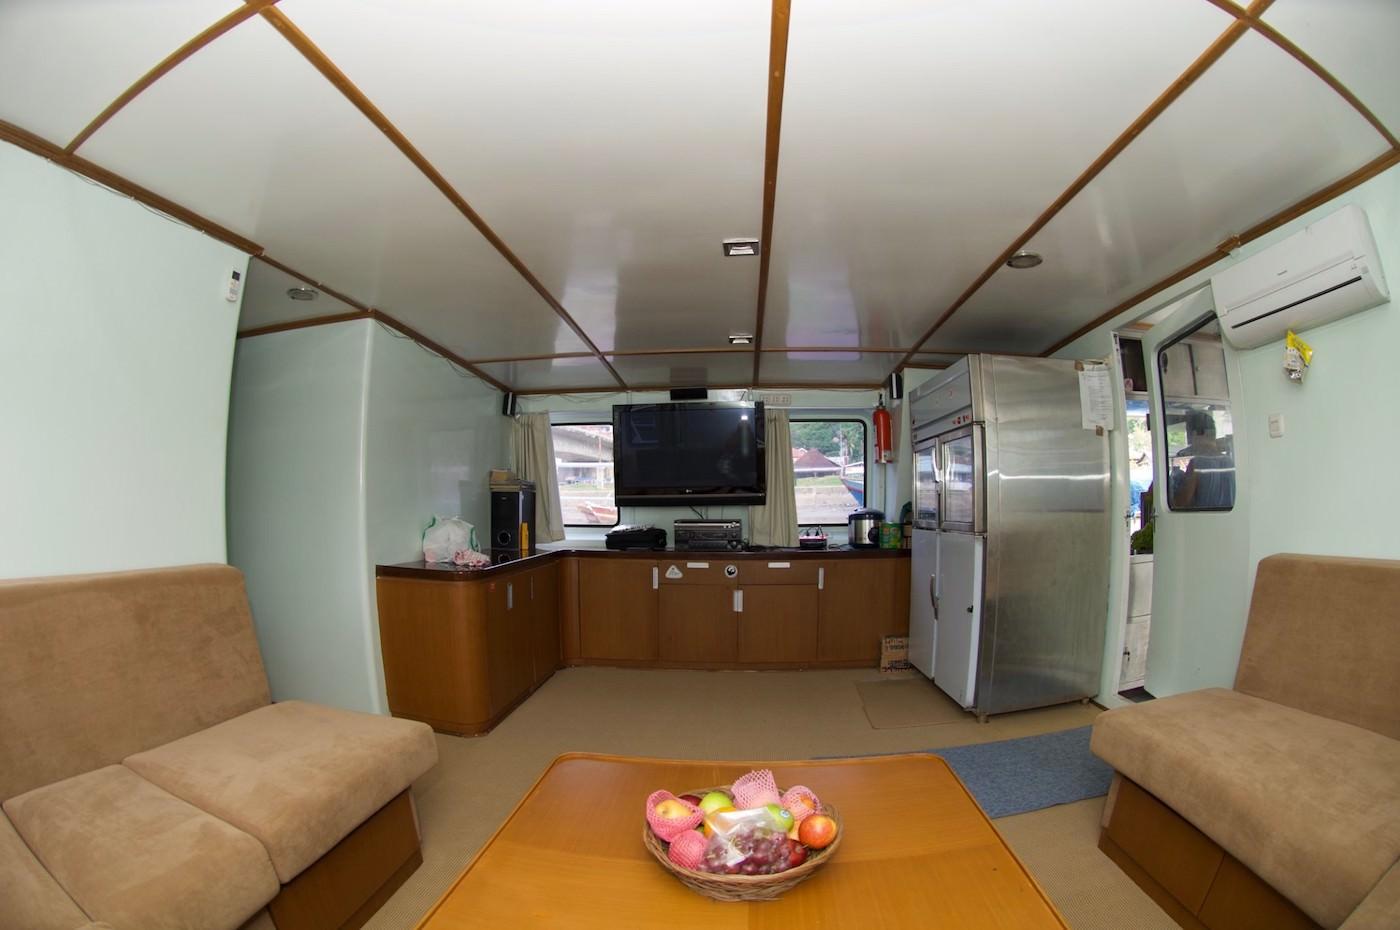 King Millenium 2 Surf Charter Catamaran Mentawai Telos Nias Interior